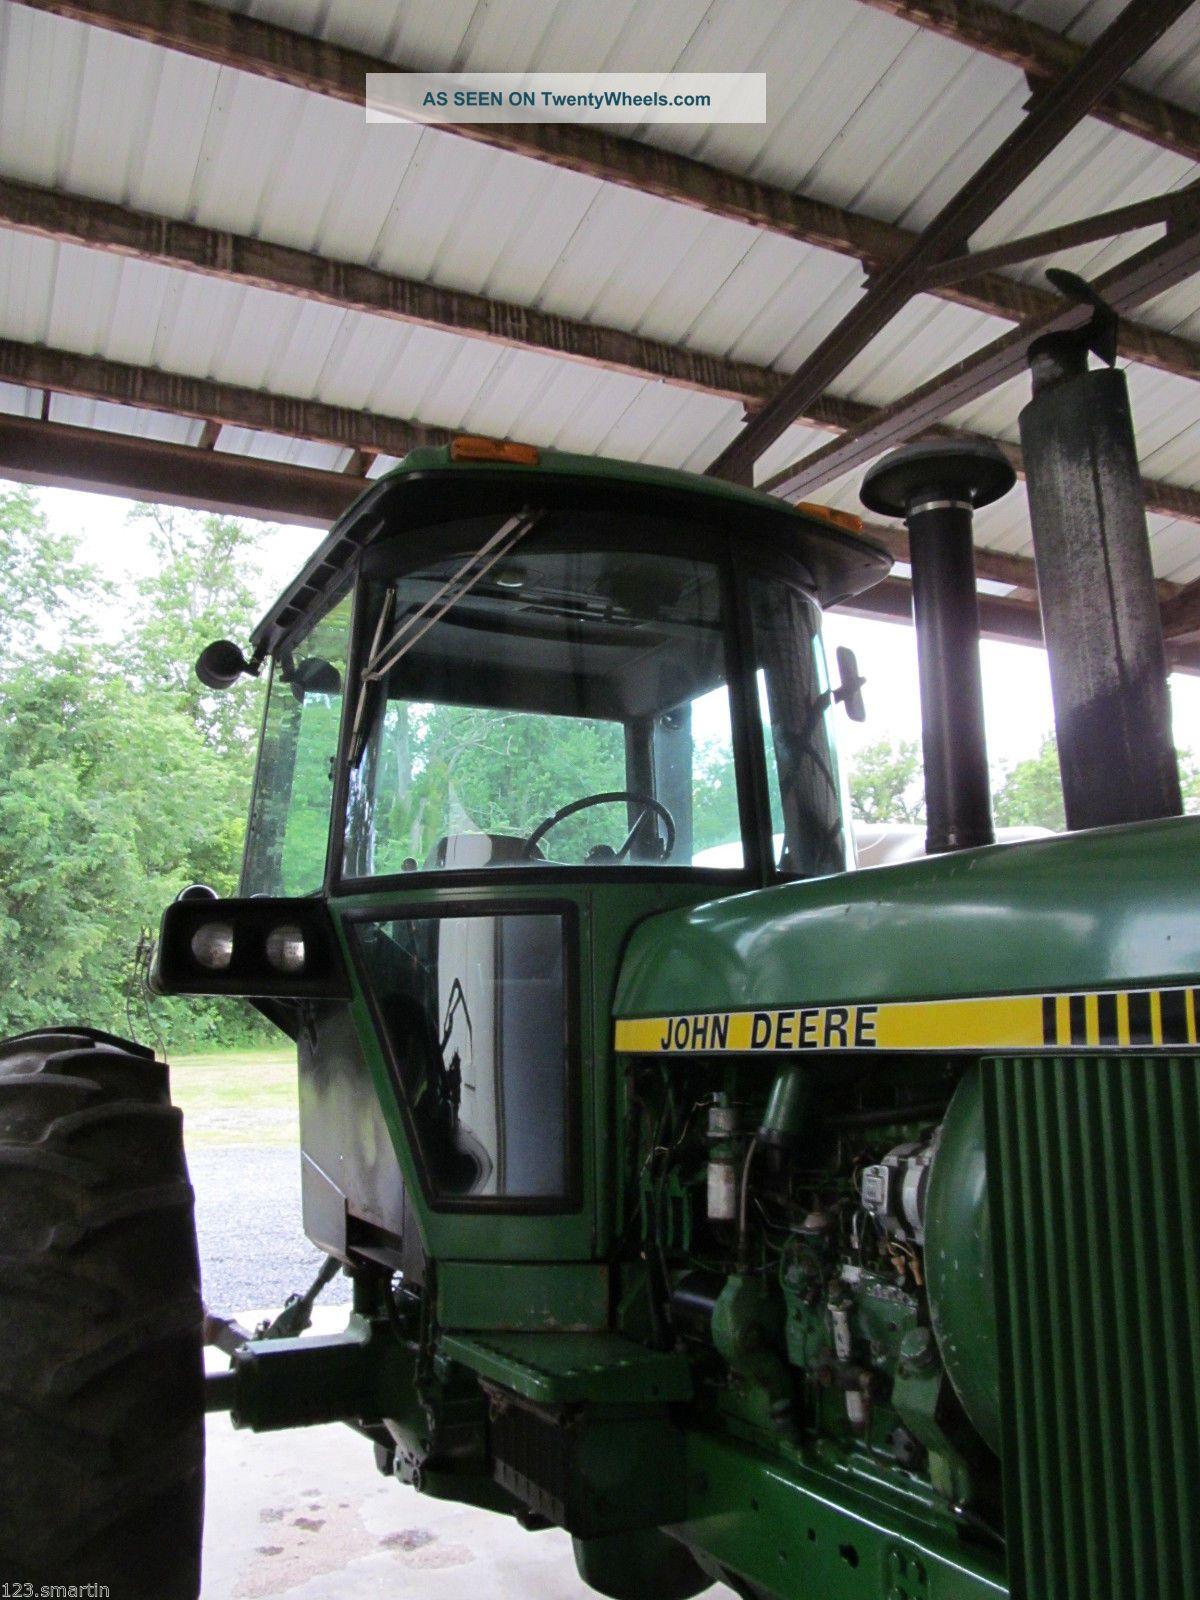 john deere 4440 farm tractor 130 hp quad range dual. Black Bedroom Furniture Sets. Home Design Ideas